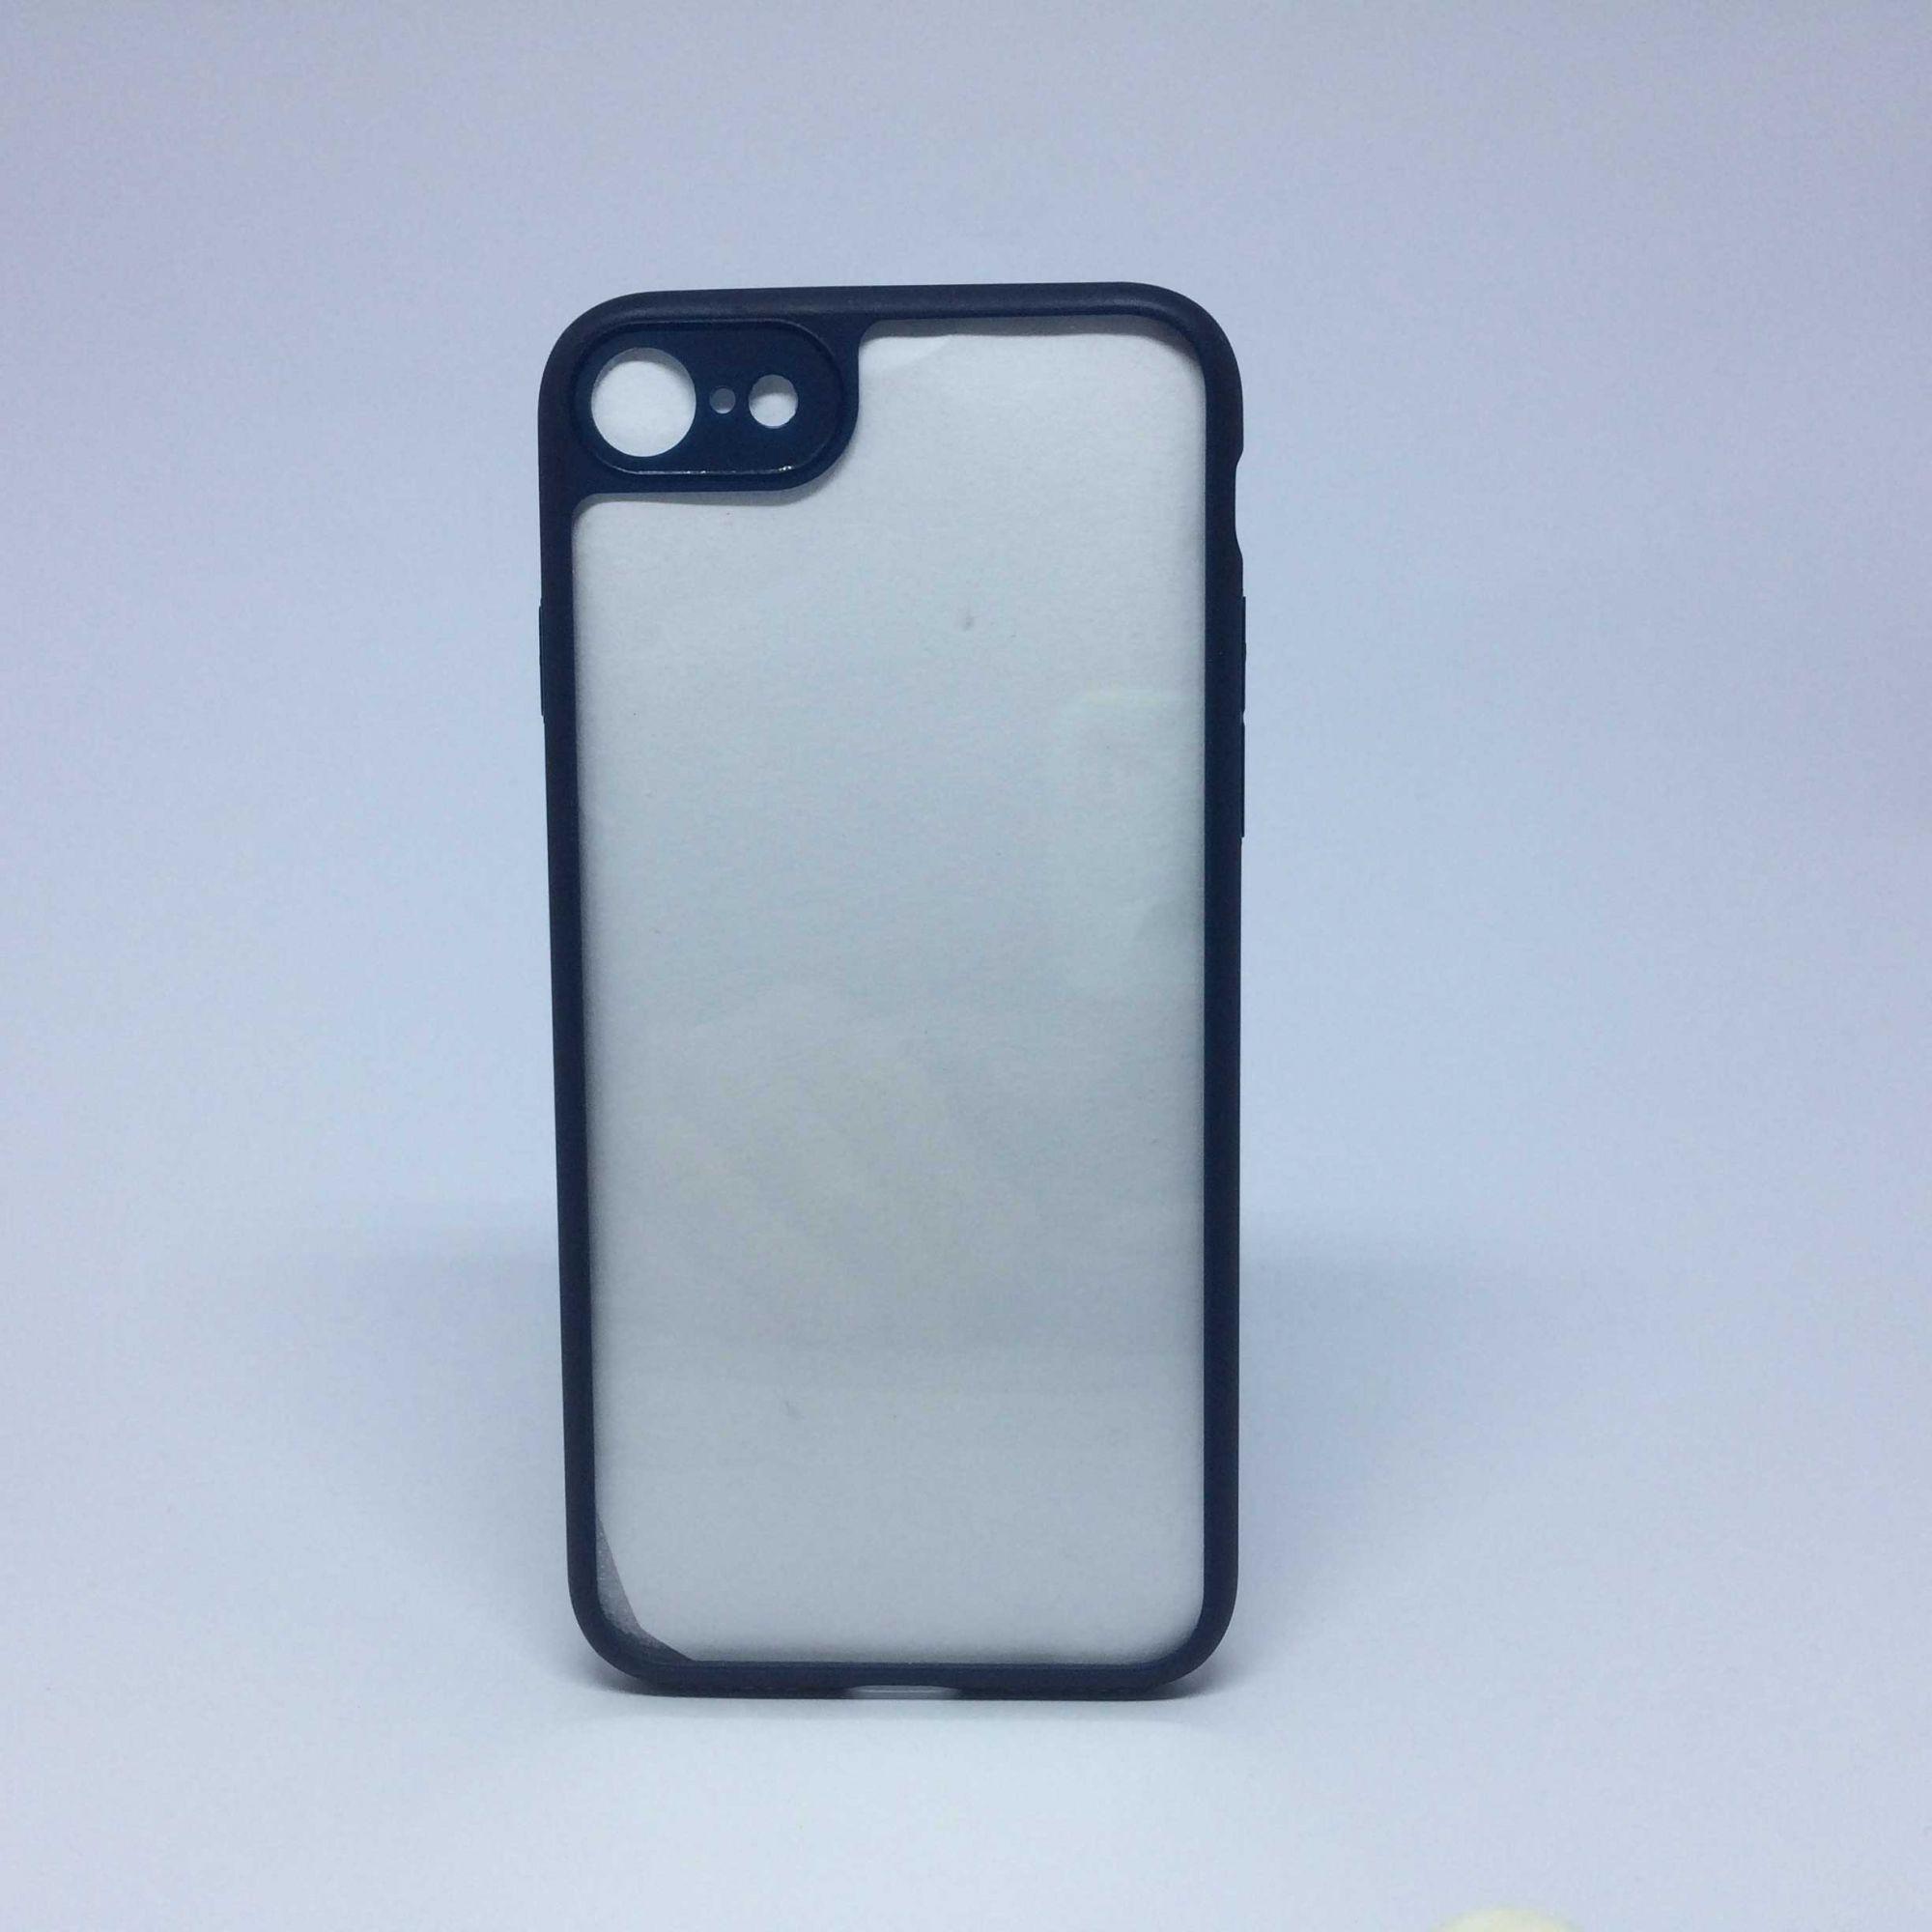 Capa iPhone 6s SGP Transparente com Borda Colorida